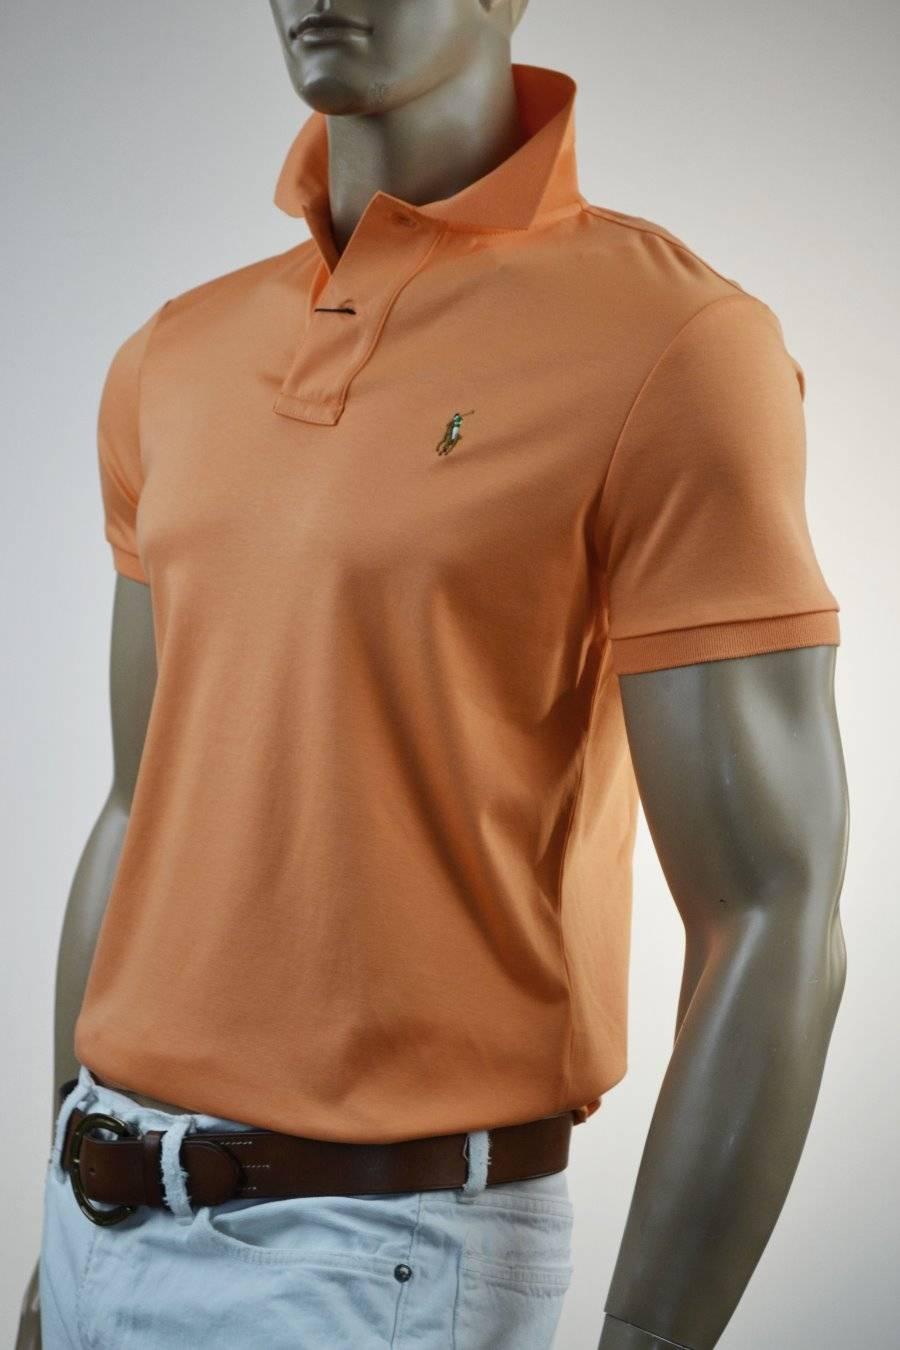 3cce85f1 Ralph Lauren Classic Fit Peach Orange Pima Cotton Short Sleeve Polo Shirt/  Pony - NWT